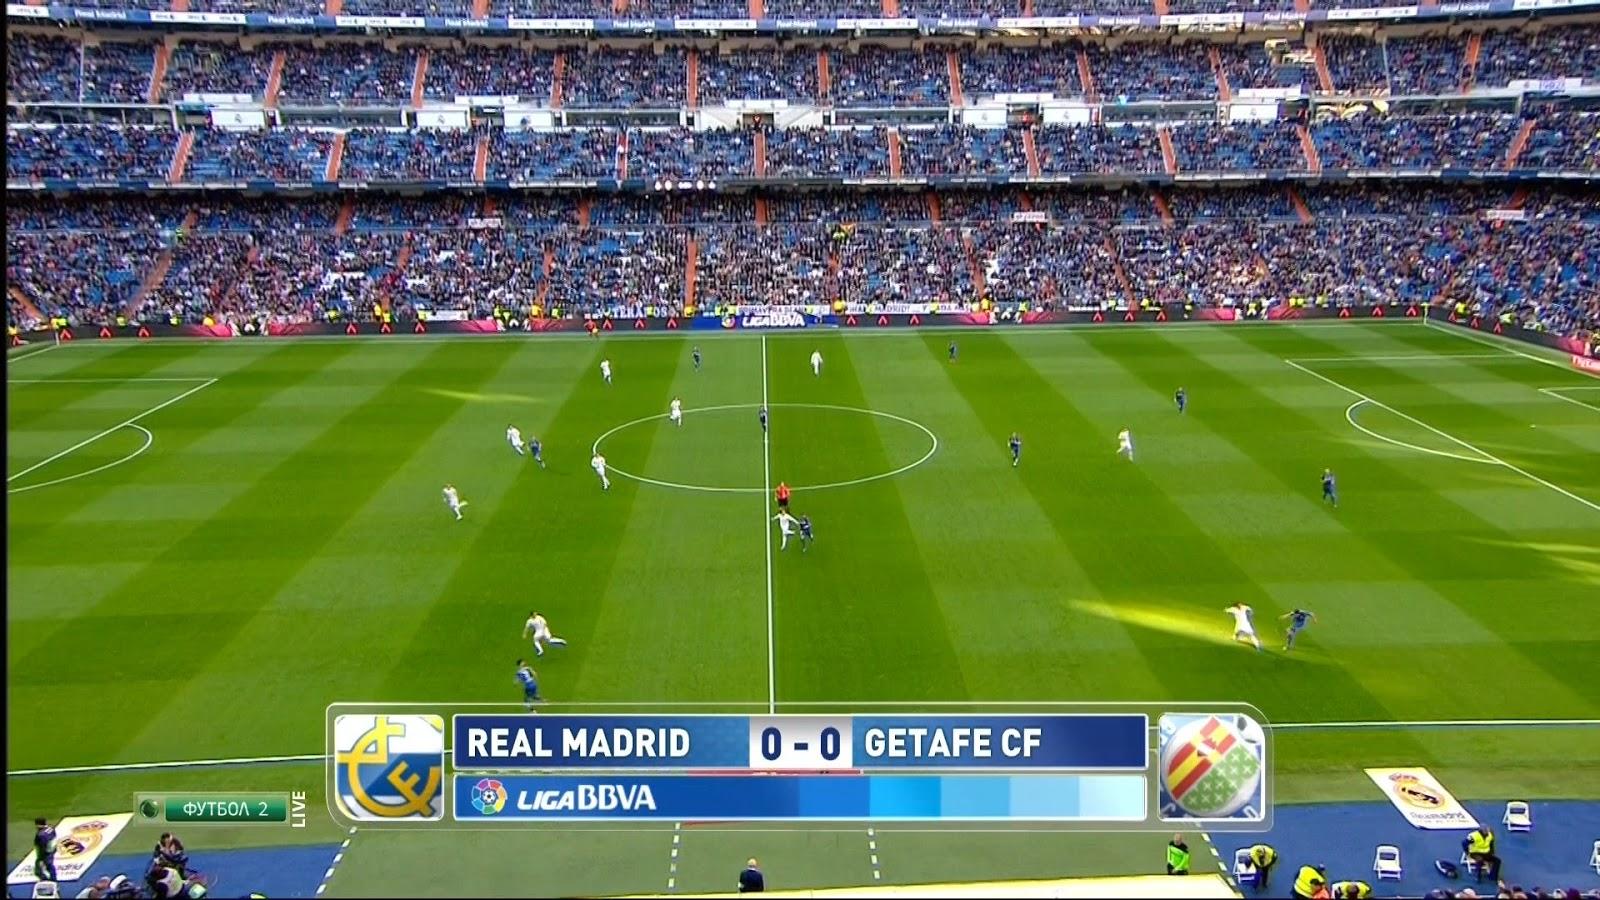 Real Madrid Vs Getafe La Liga 2013 Brilliant Second: REAL MADRID HD(12.10.2013): REAL MADRID